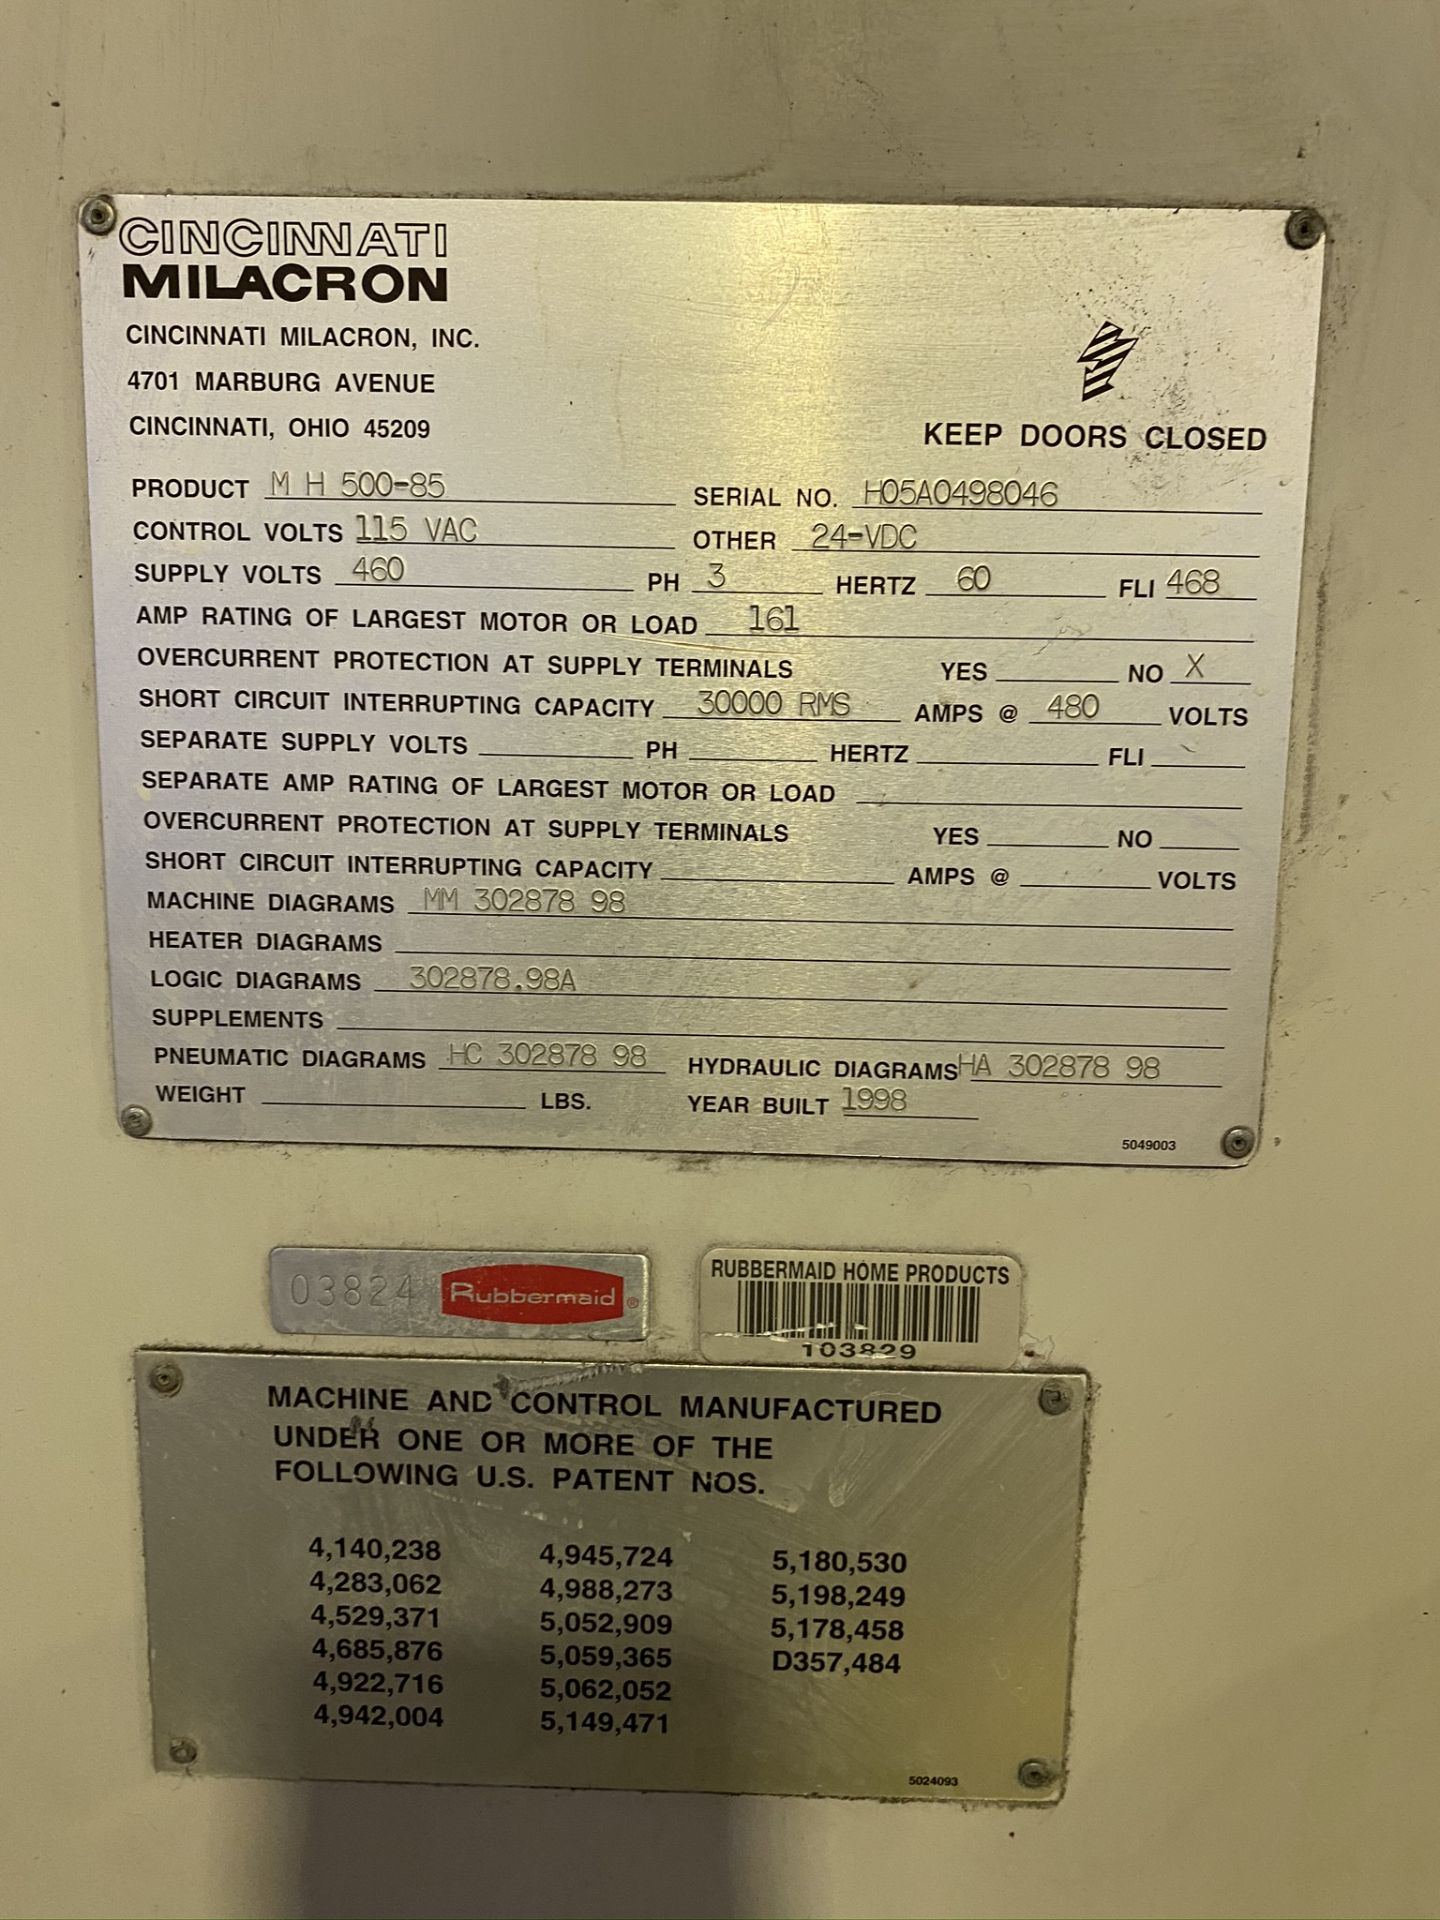 Lot 7 - 1998 CINCINNATI MILACRON MAGNA, 500 TON, MODEL MH 500-85, CAMAC 486C CONTROL, 85 OZ SHOT SIZE